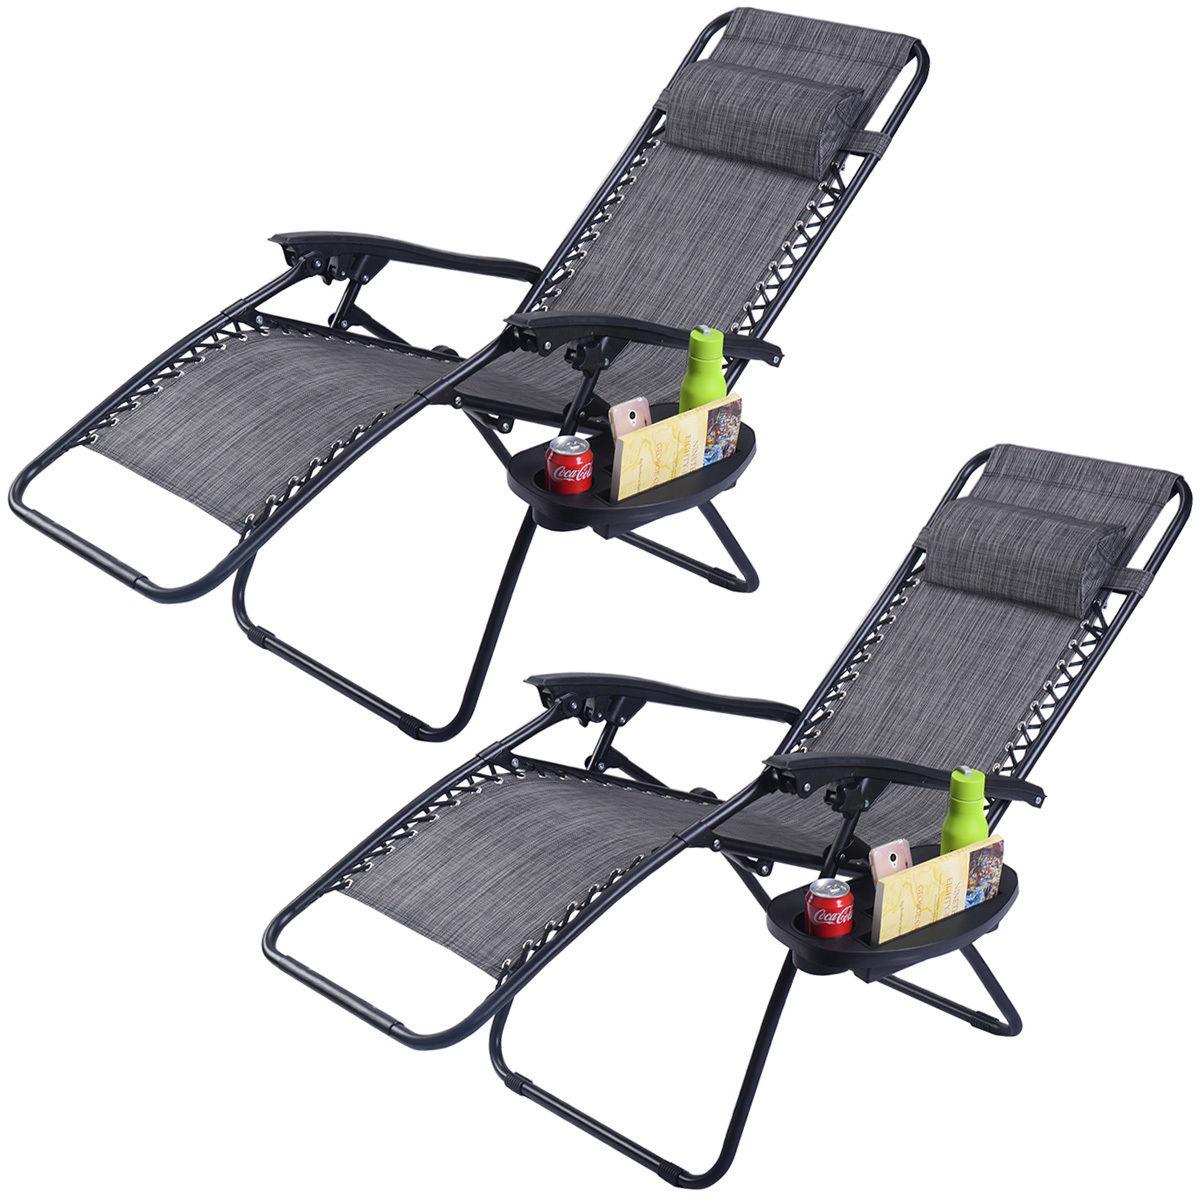 2PC Folding Zero Gravity Reclining Lounge Chairs Beach Patio W/ Utility Tray - image 8 of 8